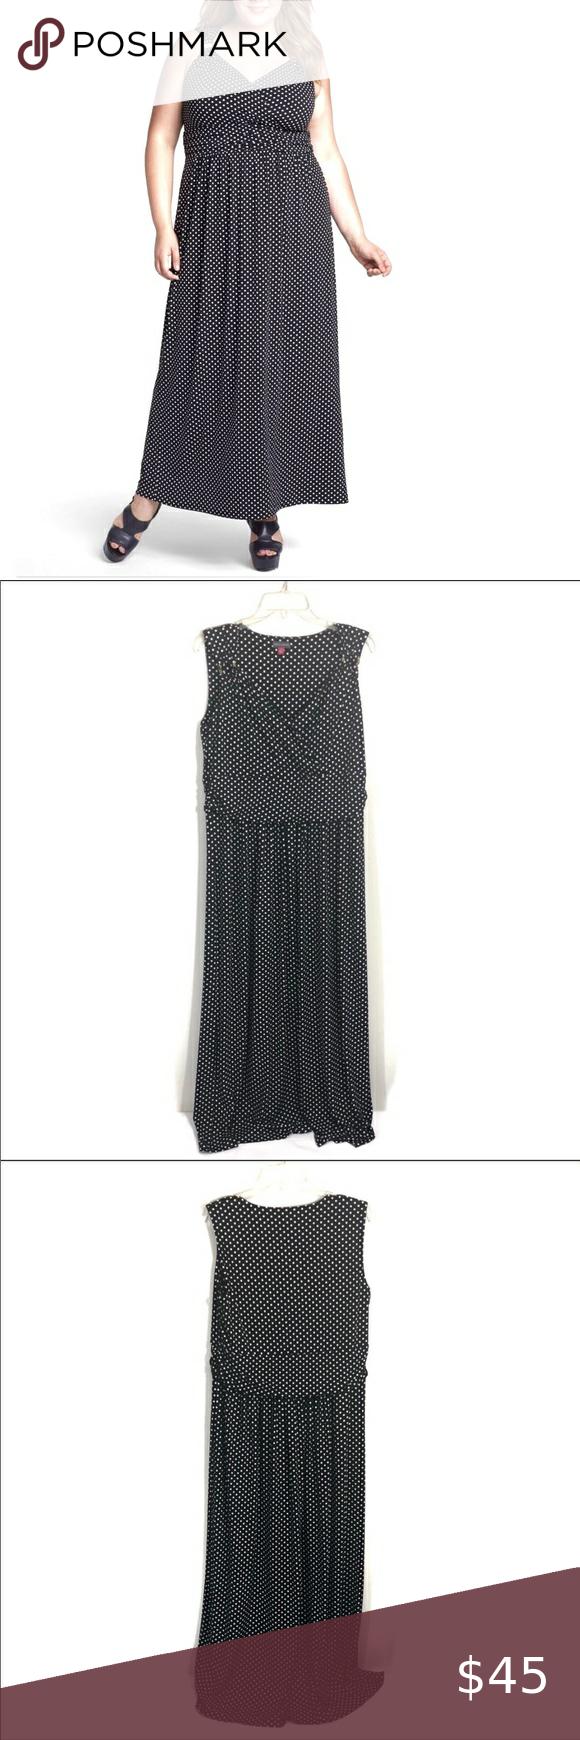 Vince Camuto Sleeveless Polka Dot Maxi Dress Gold Polka Dot Maxi Dresses Black White Maxi Dress Maxi Dress [ 1740 x 580 Pixel ]